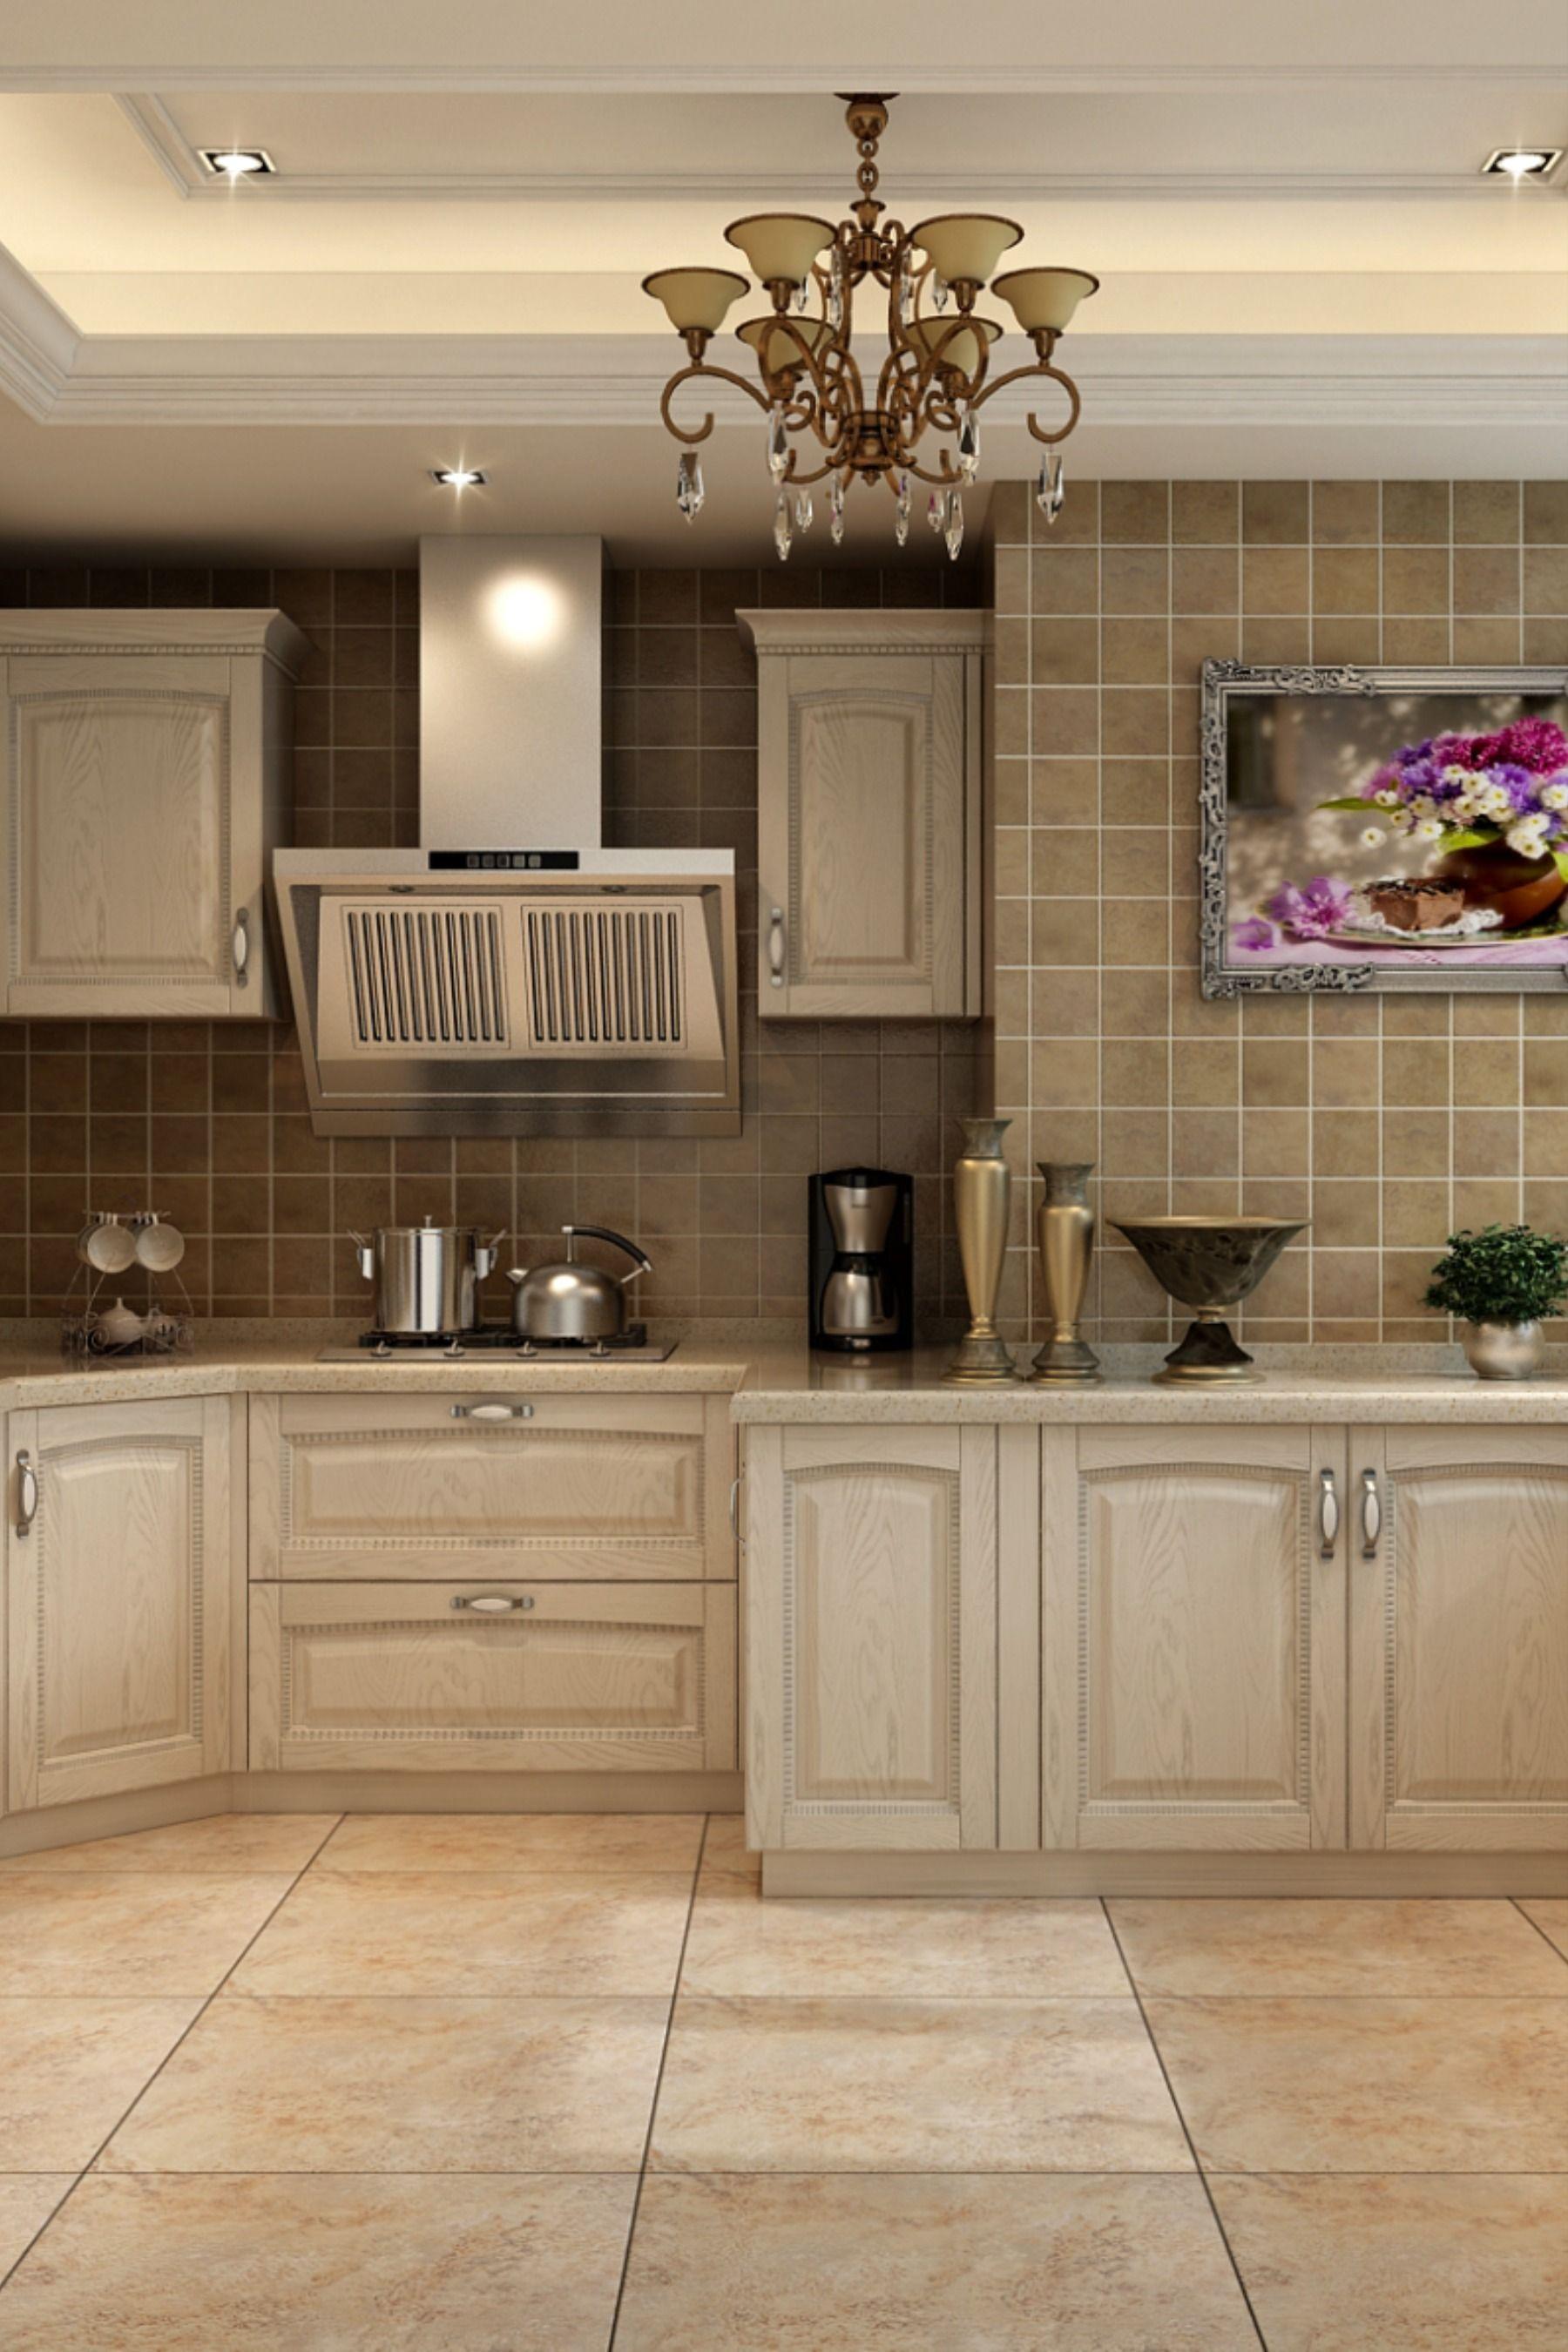 Pvc Blister Kitchen Cabinet Kitchen Cabinets Walnut Kitchen Cabinets Walnut Kitchen